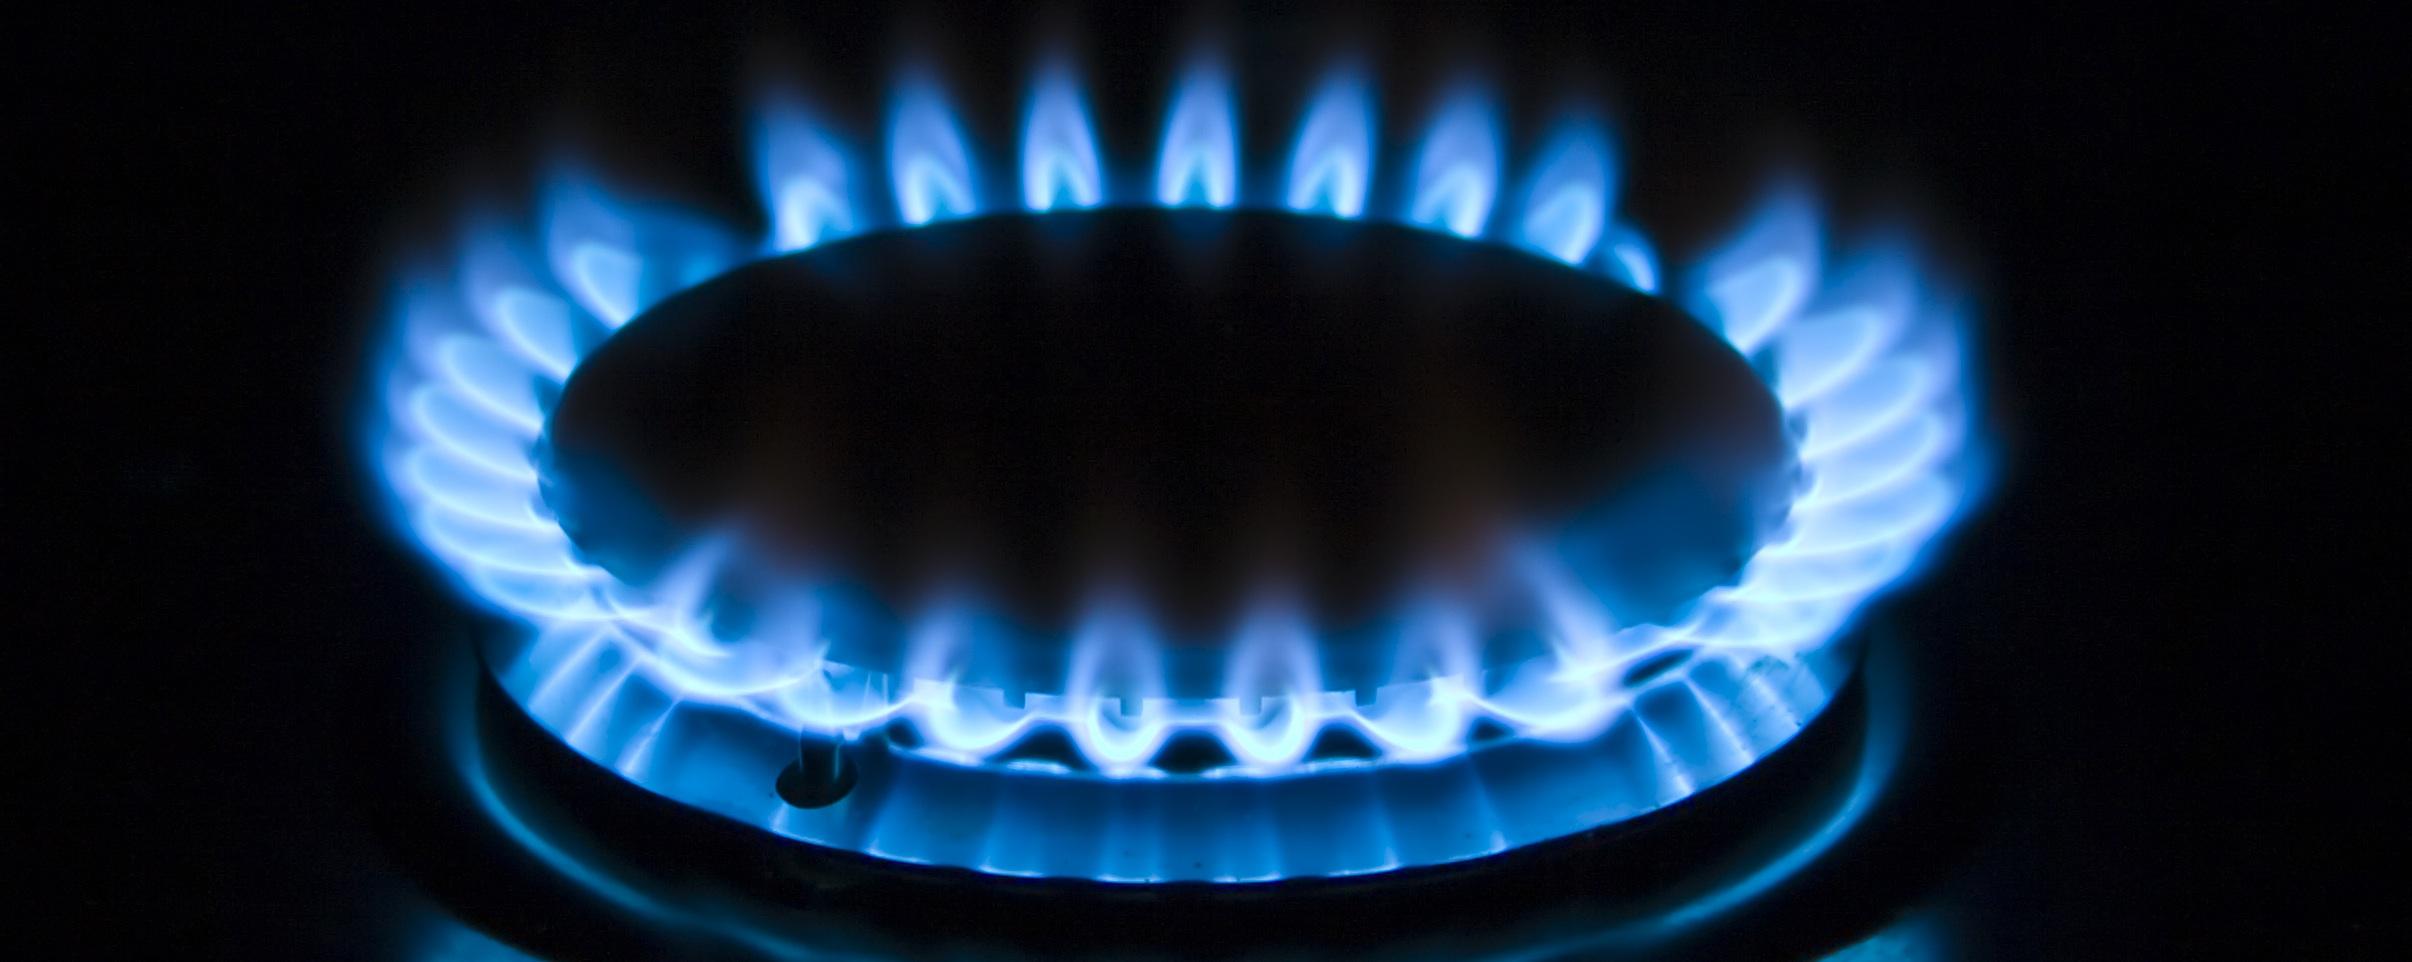 Natural Gas Wave Analysis – 14 January, 2019